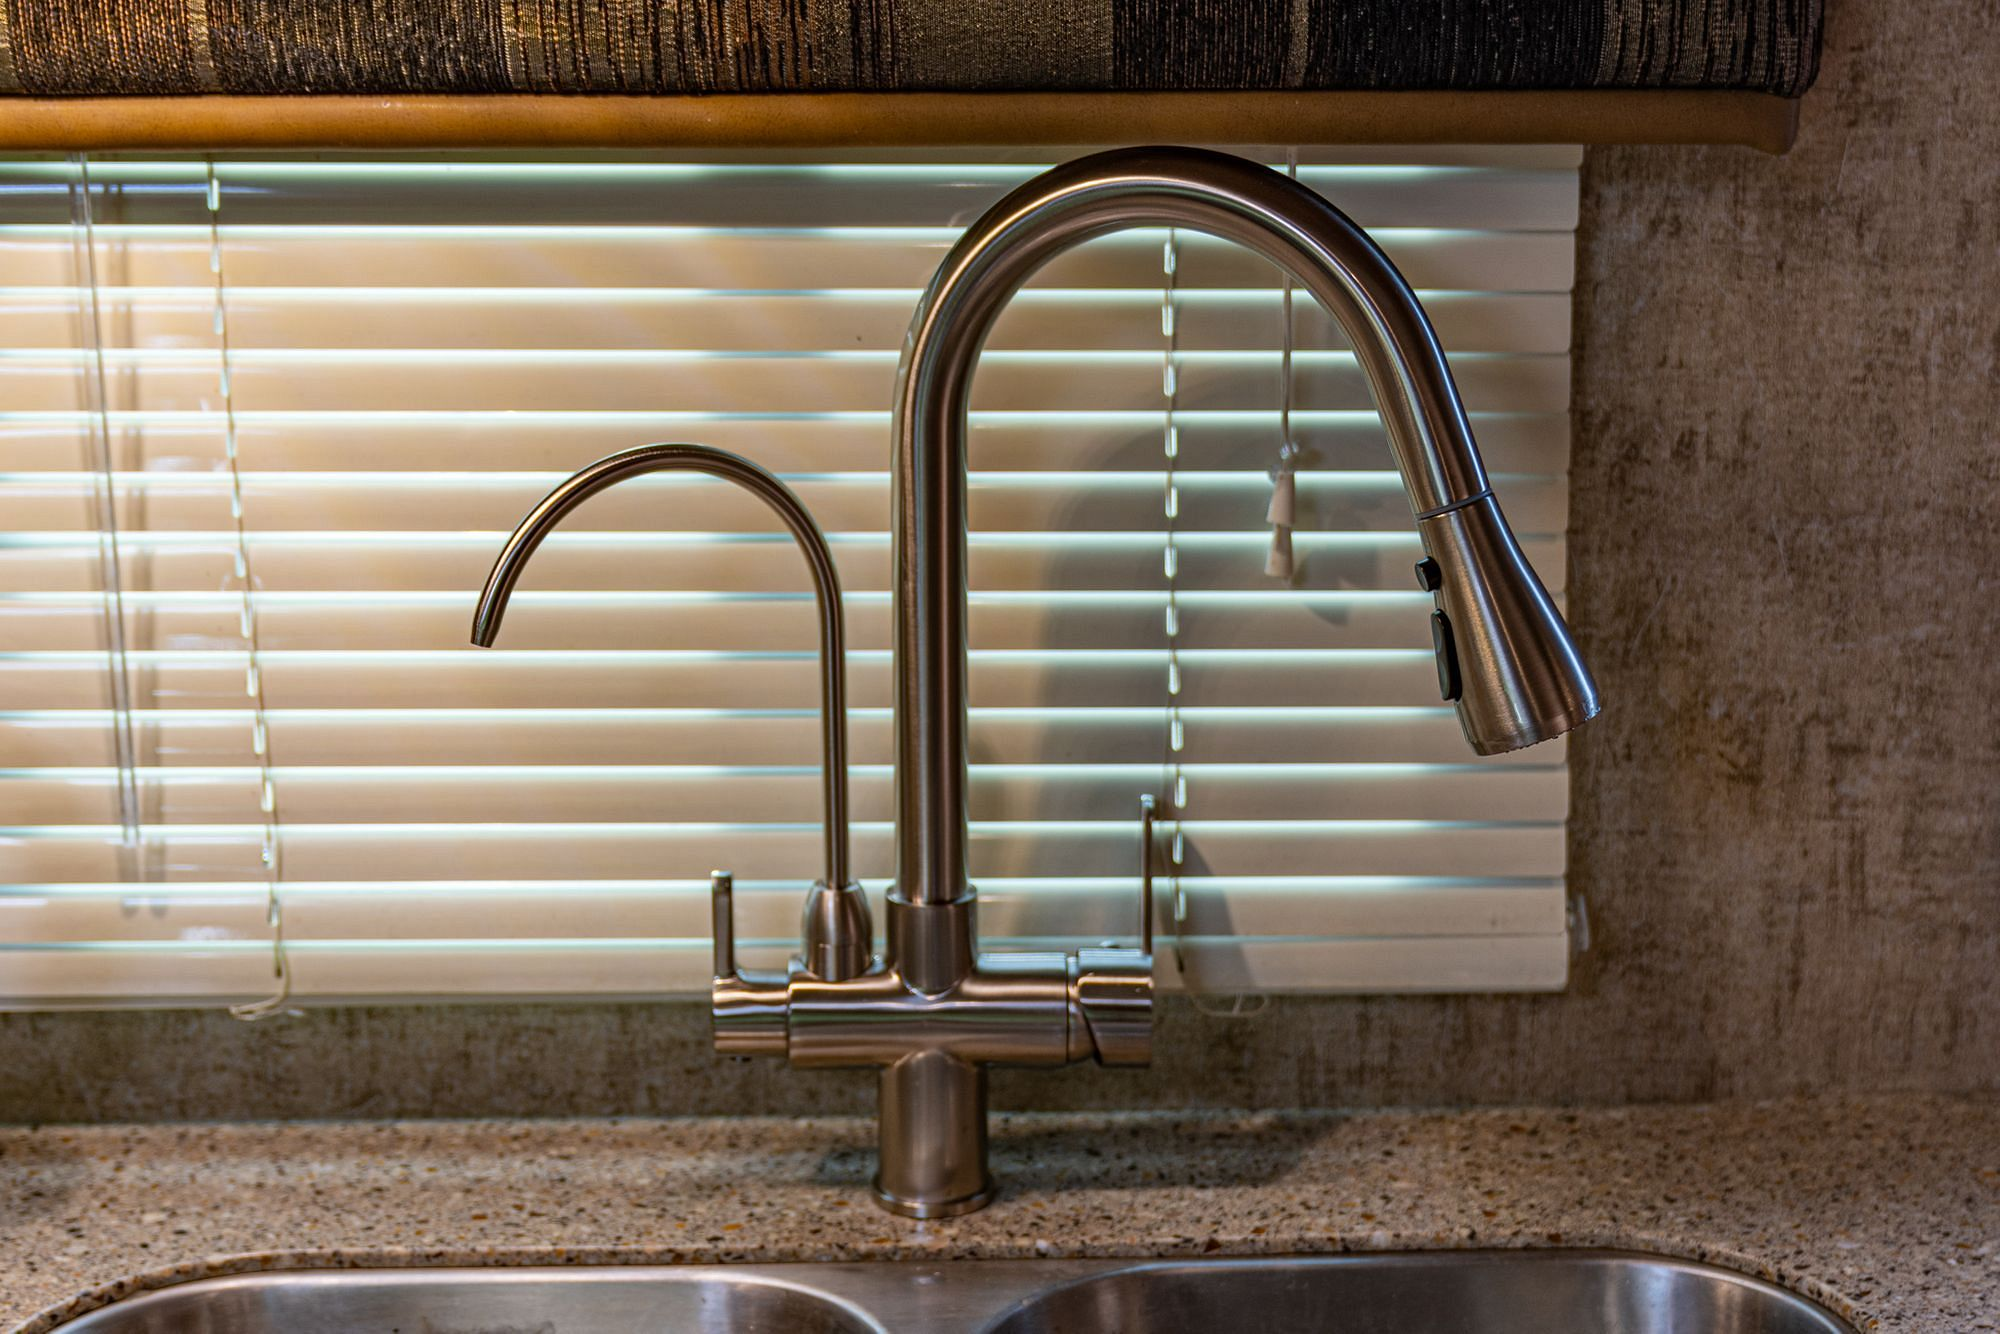 RV Kitchen Faucet Upgrade